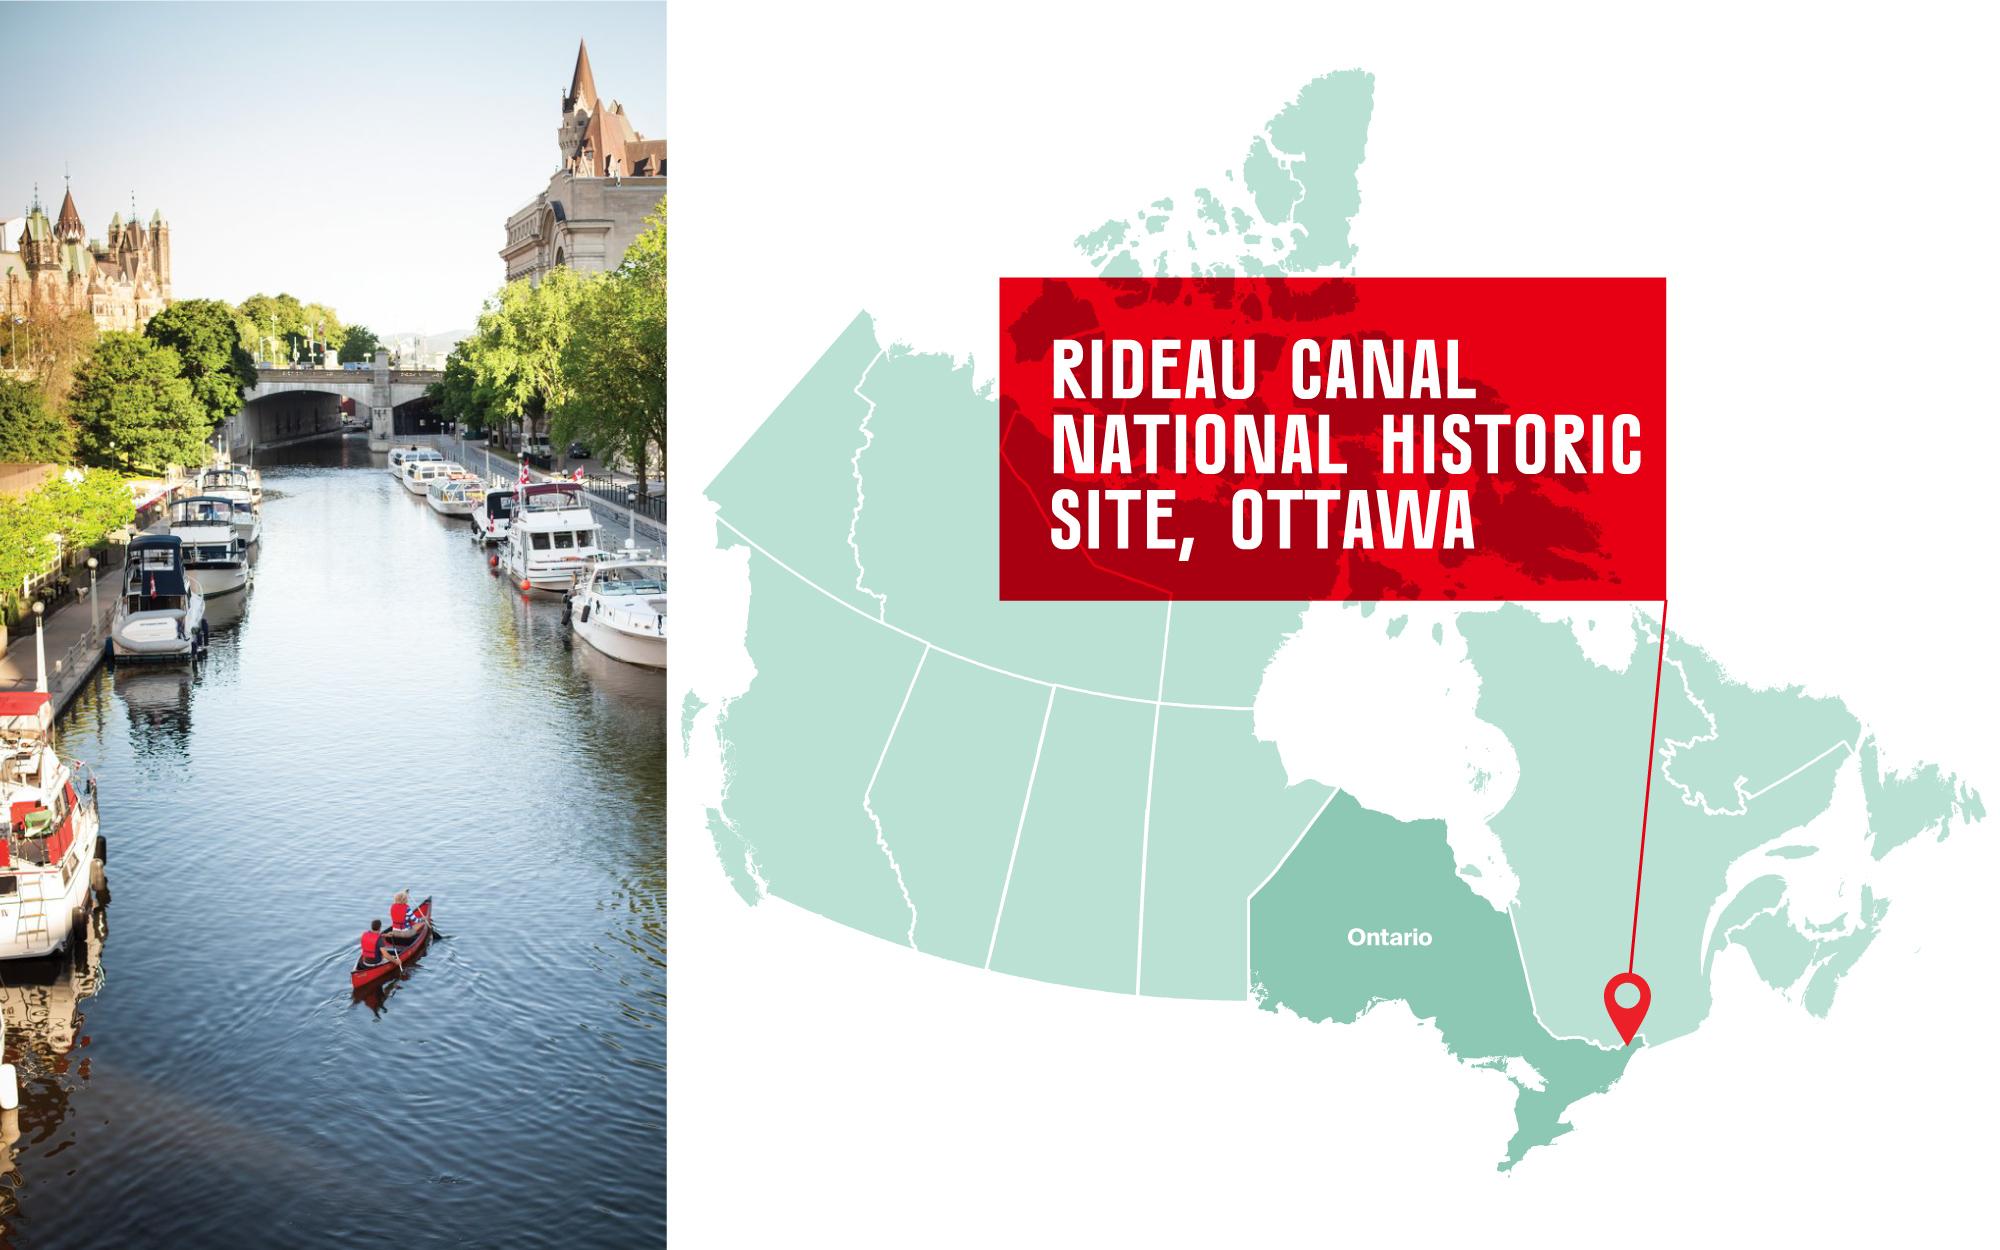 Photo Credit: Destination Canada